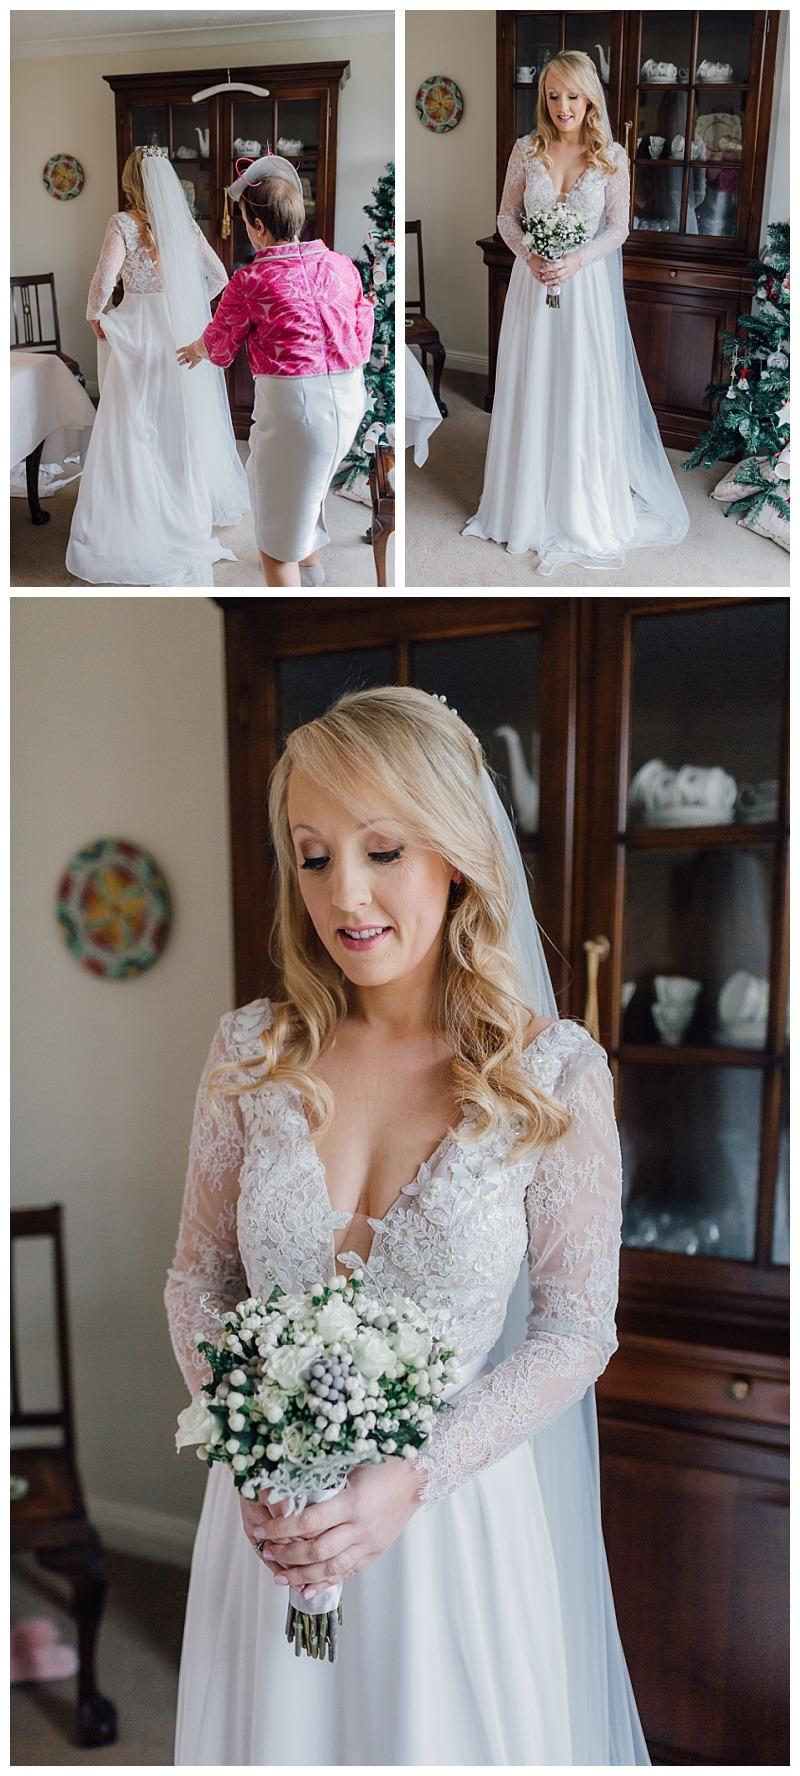 eden-photography-wedding-photography-glenview-hotel-wicklow-fiona-william